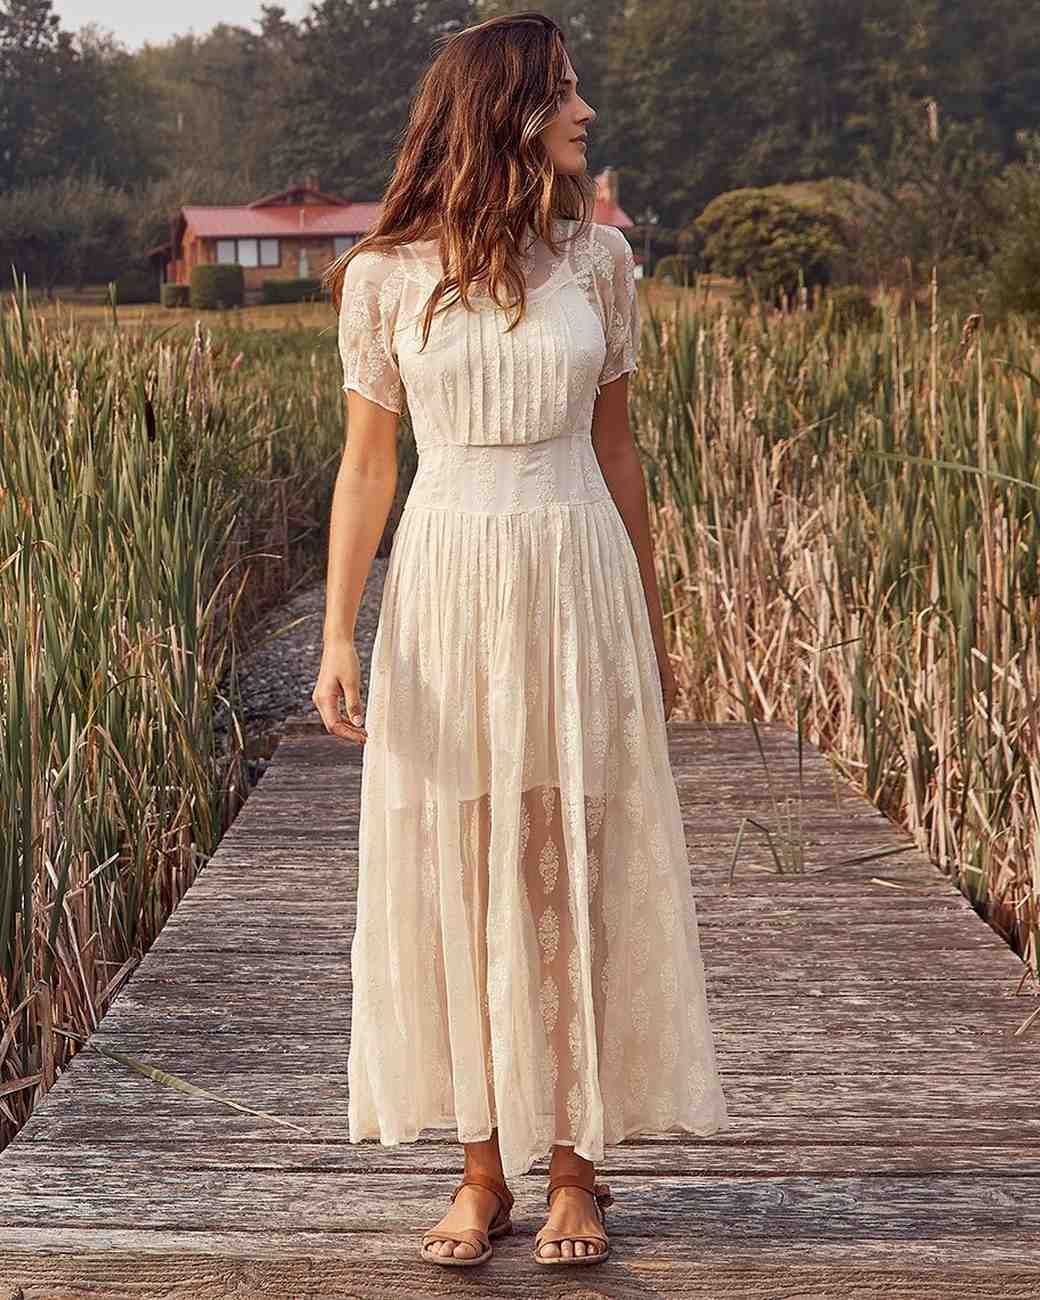 christy dawn winslet dress